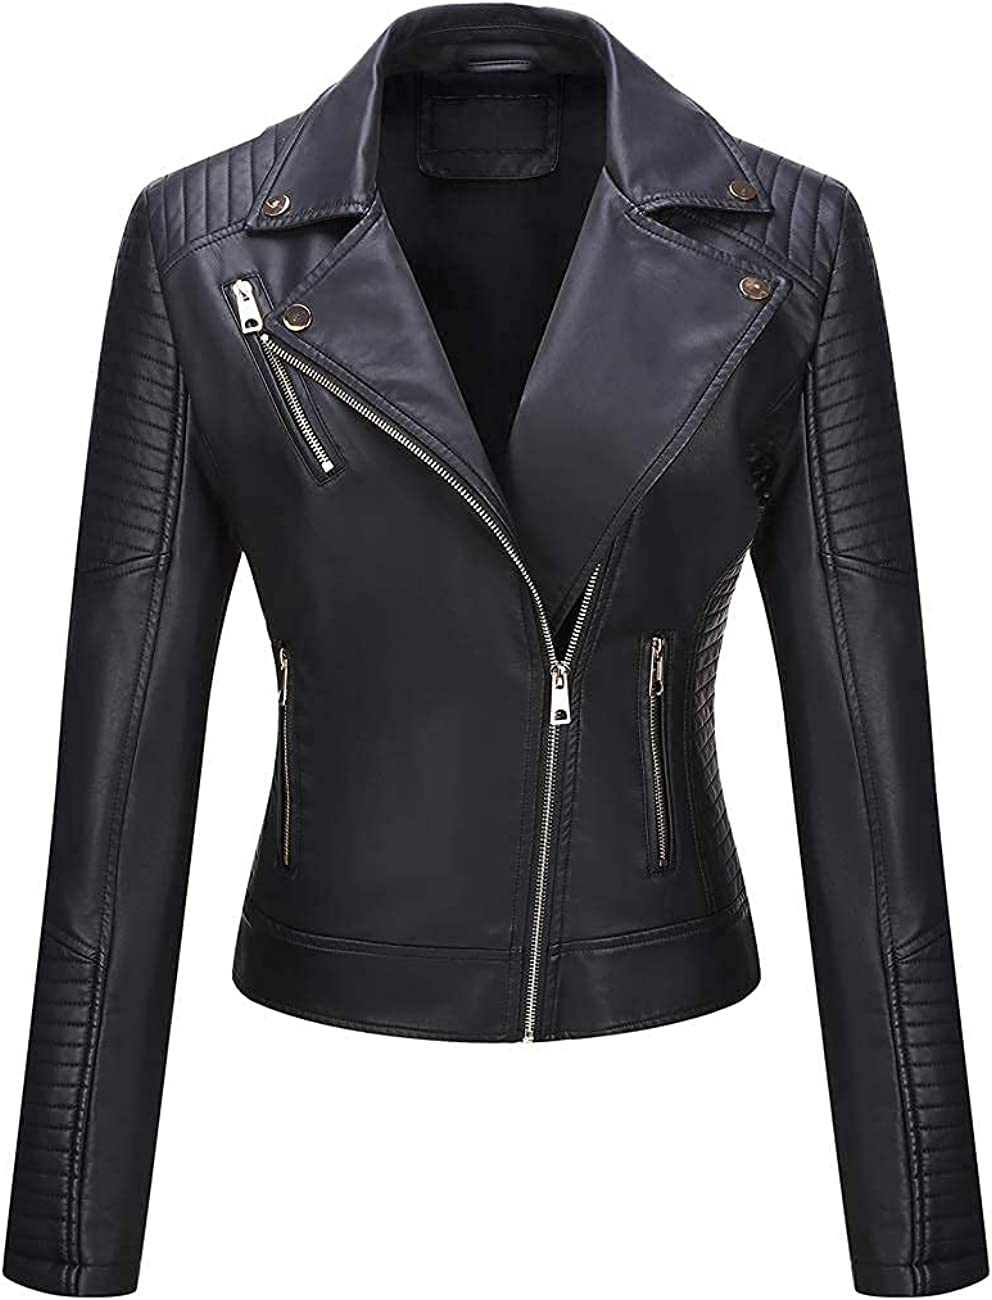 Giolshon Faux Leather Short Jacket Women Motorcycle Casual Coat